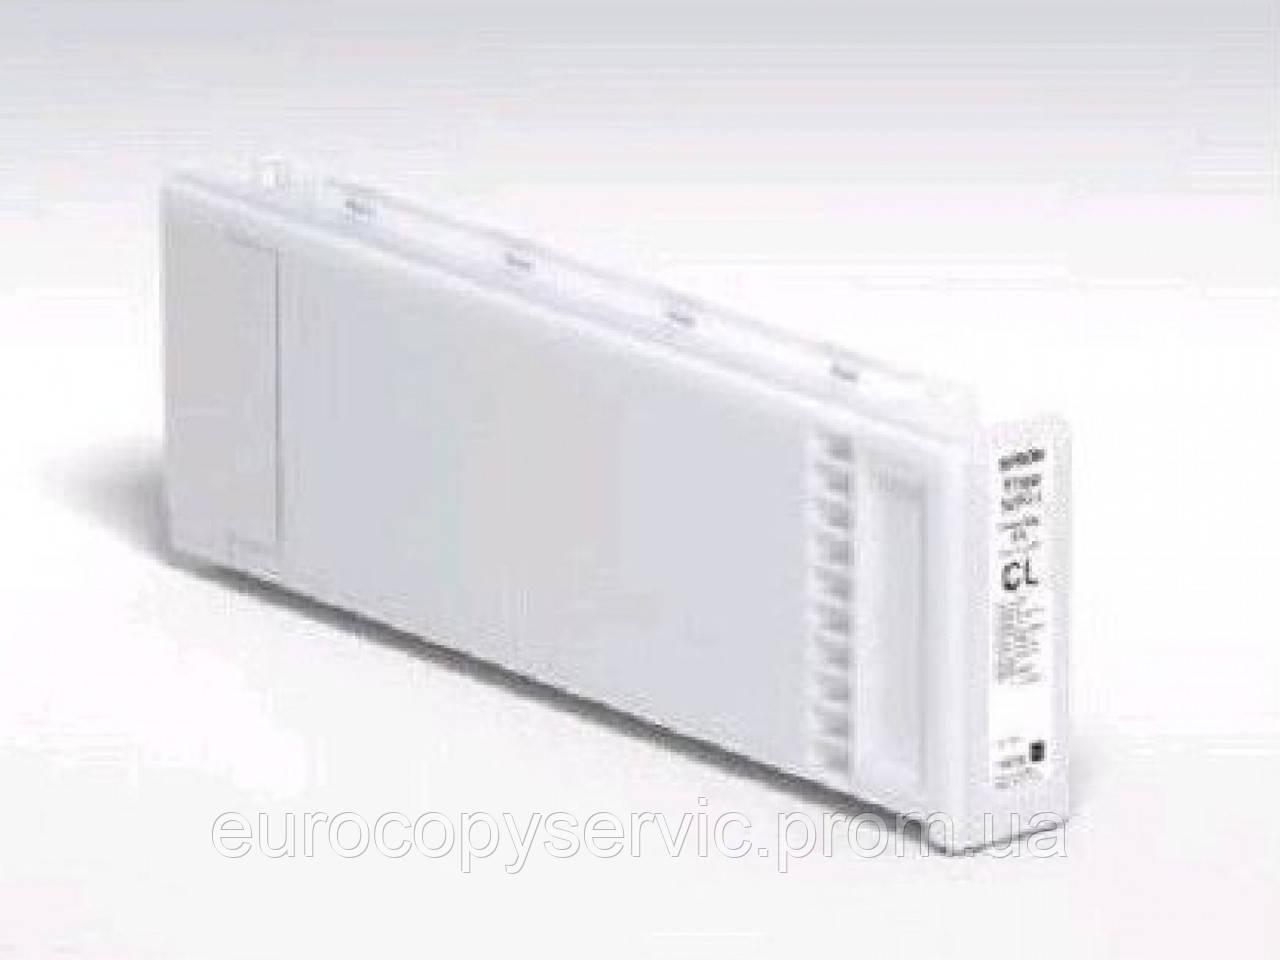 Чистящий картридж Singlepack Cleaning Cartridge для SureColor SC-S40610/S60610/S80610SC-S Cleaning Cartridge